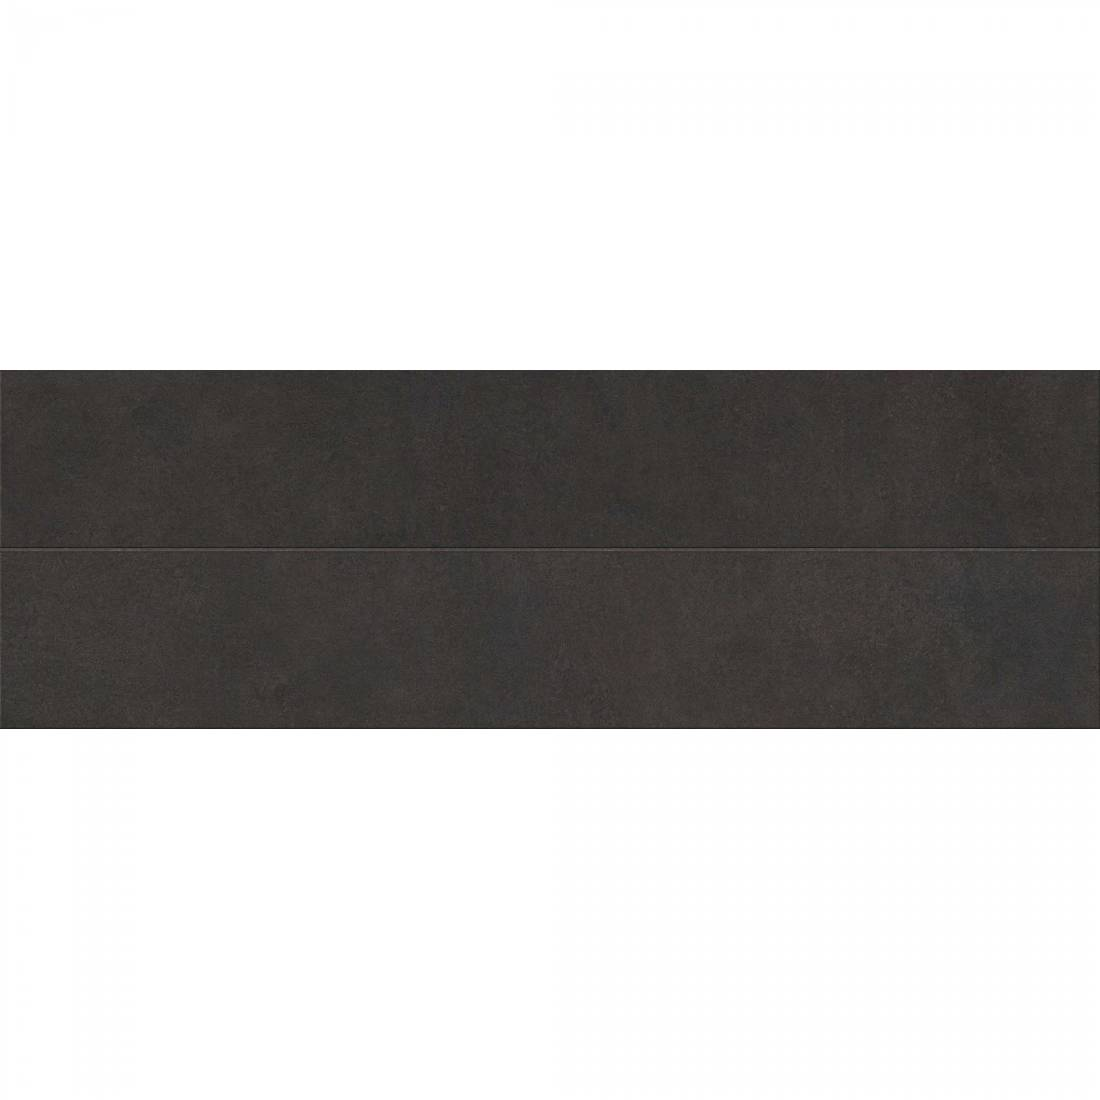 Dover 25x75 Negro Gloss 1